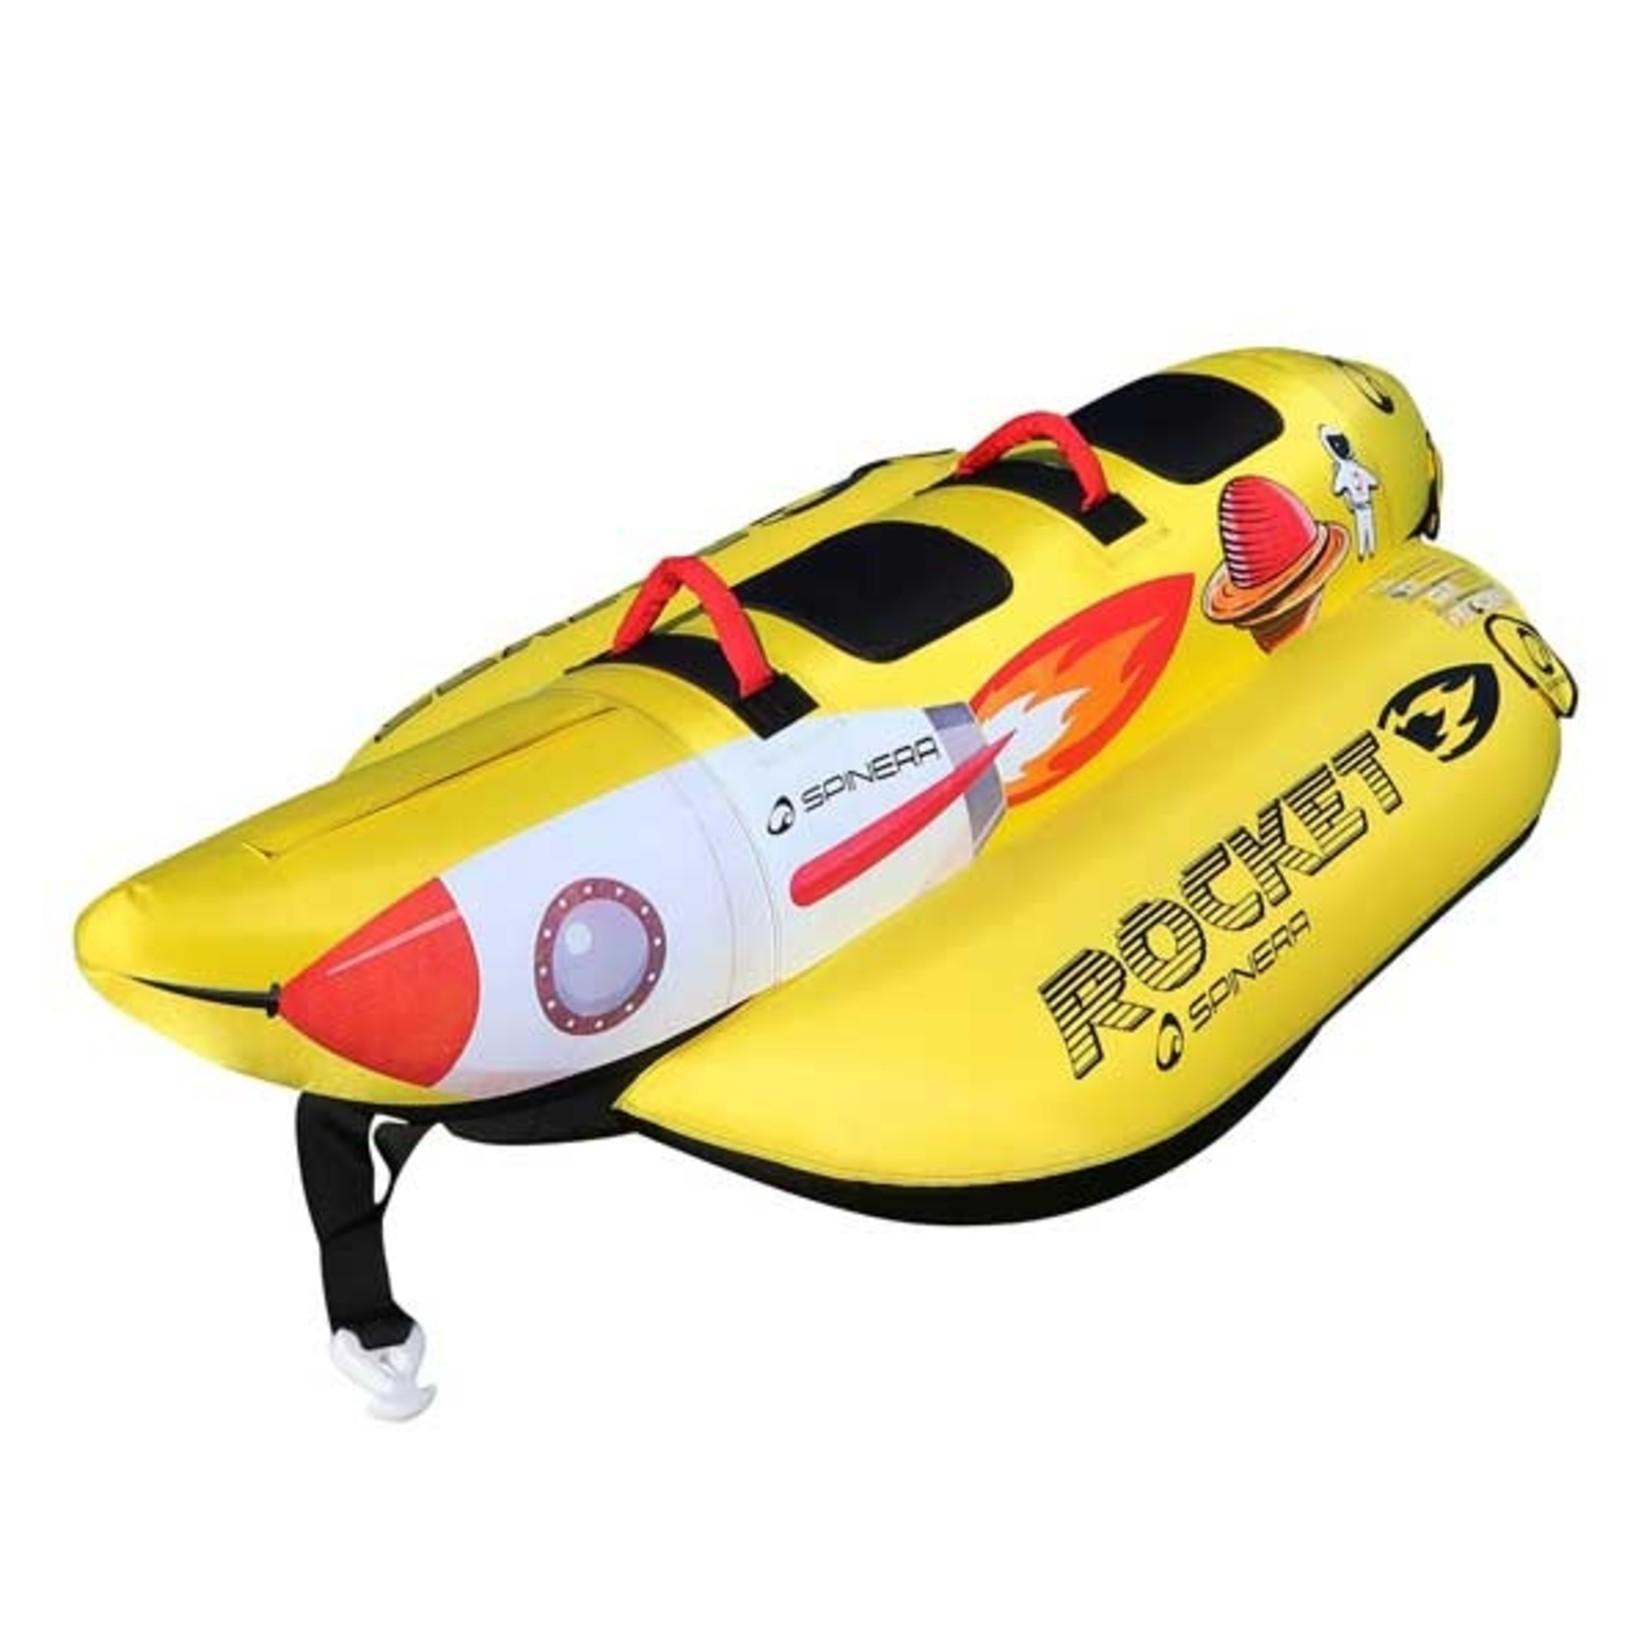 Rocket 2 - Twin Banana